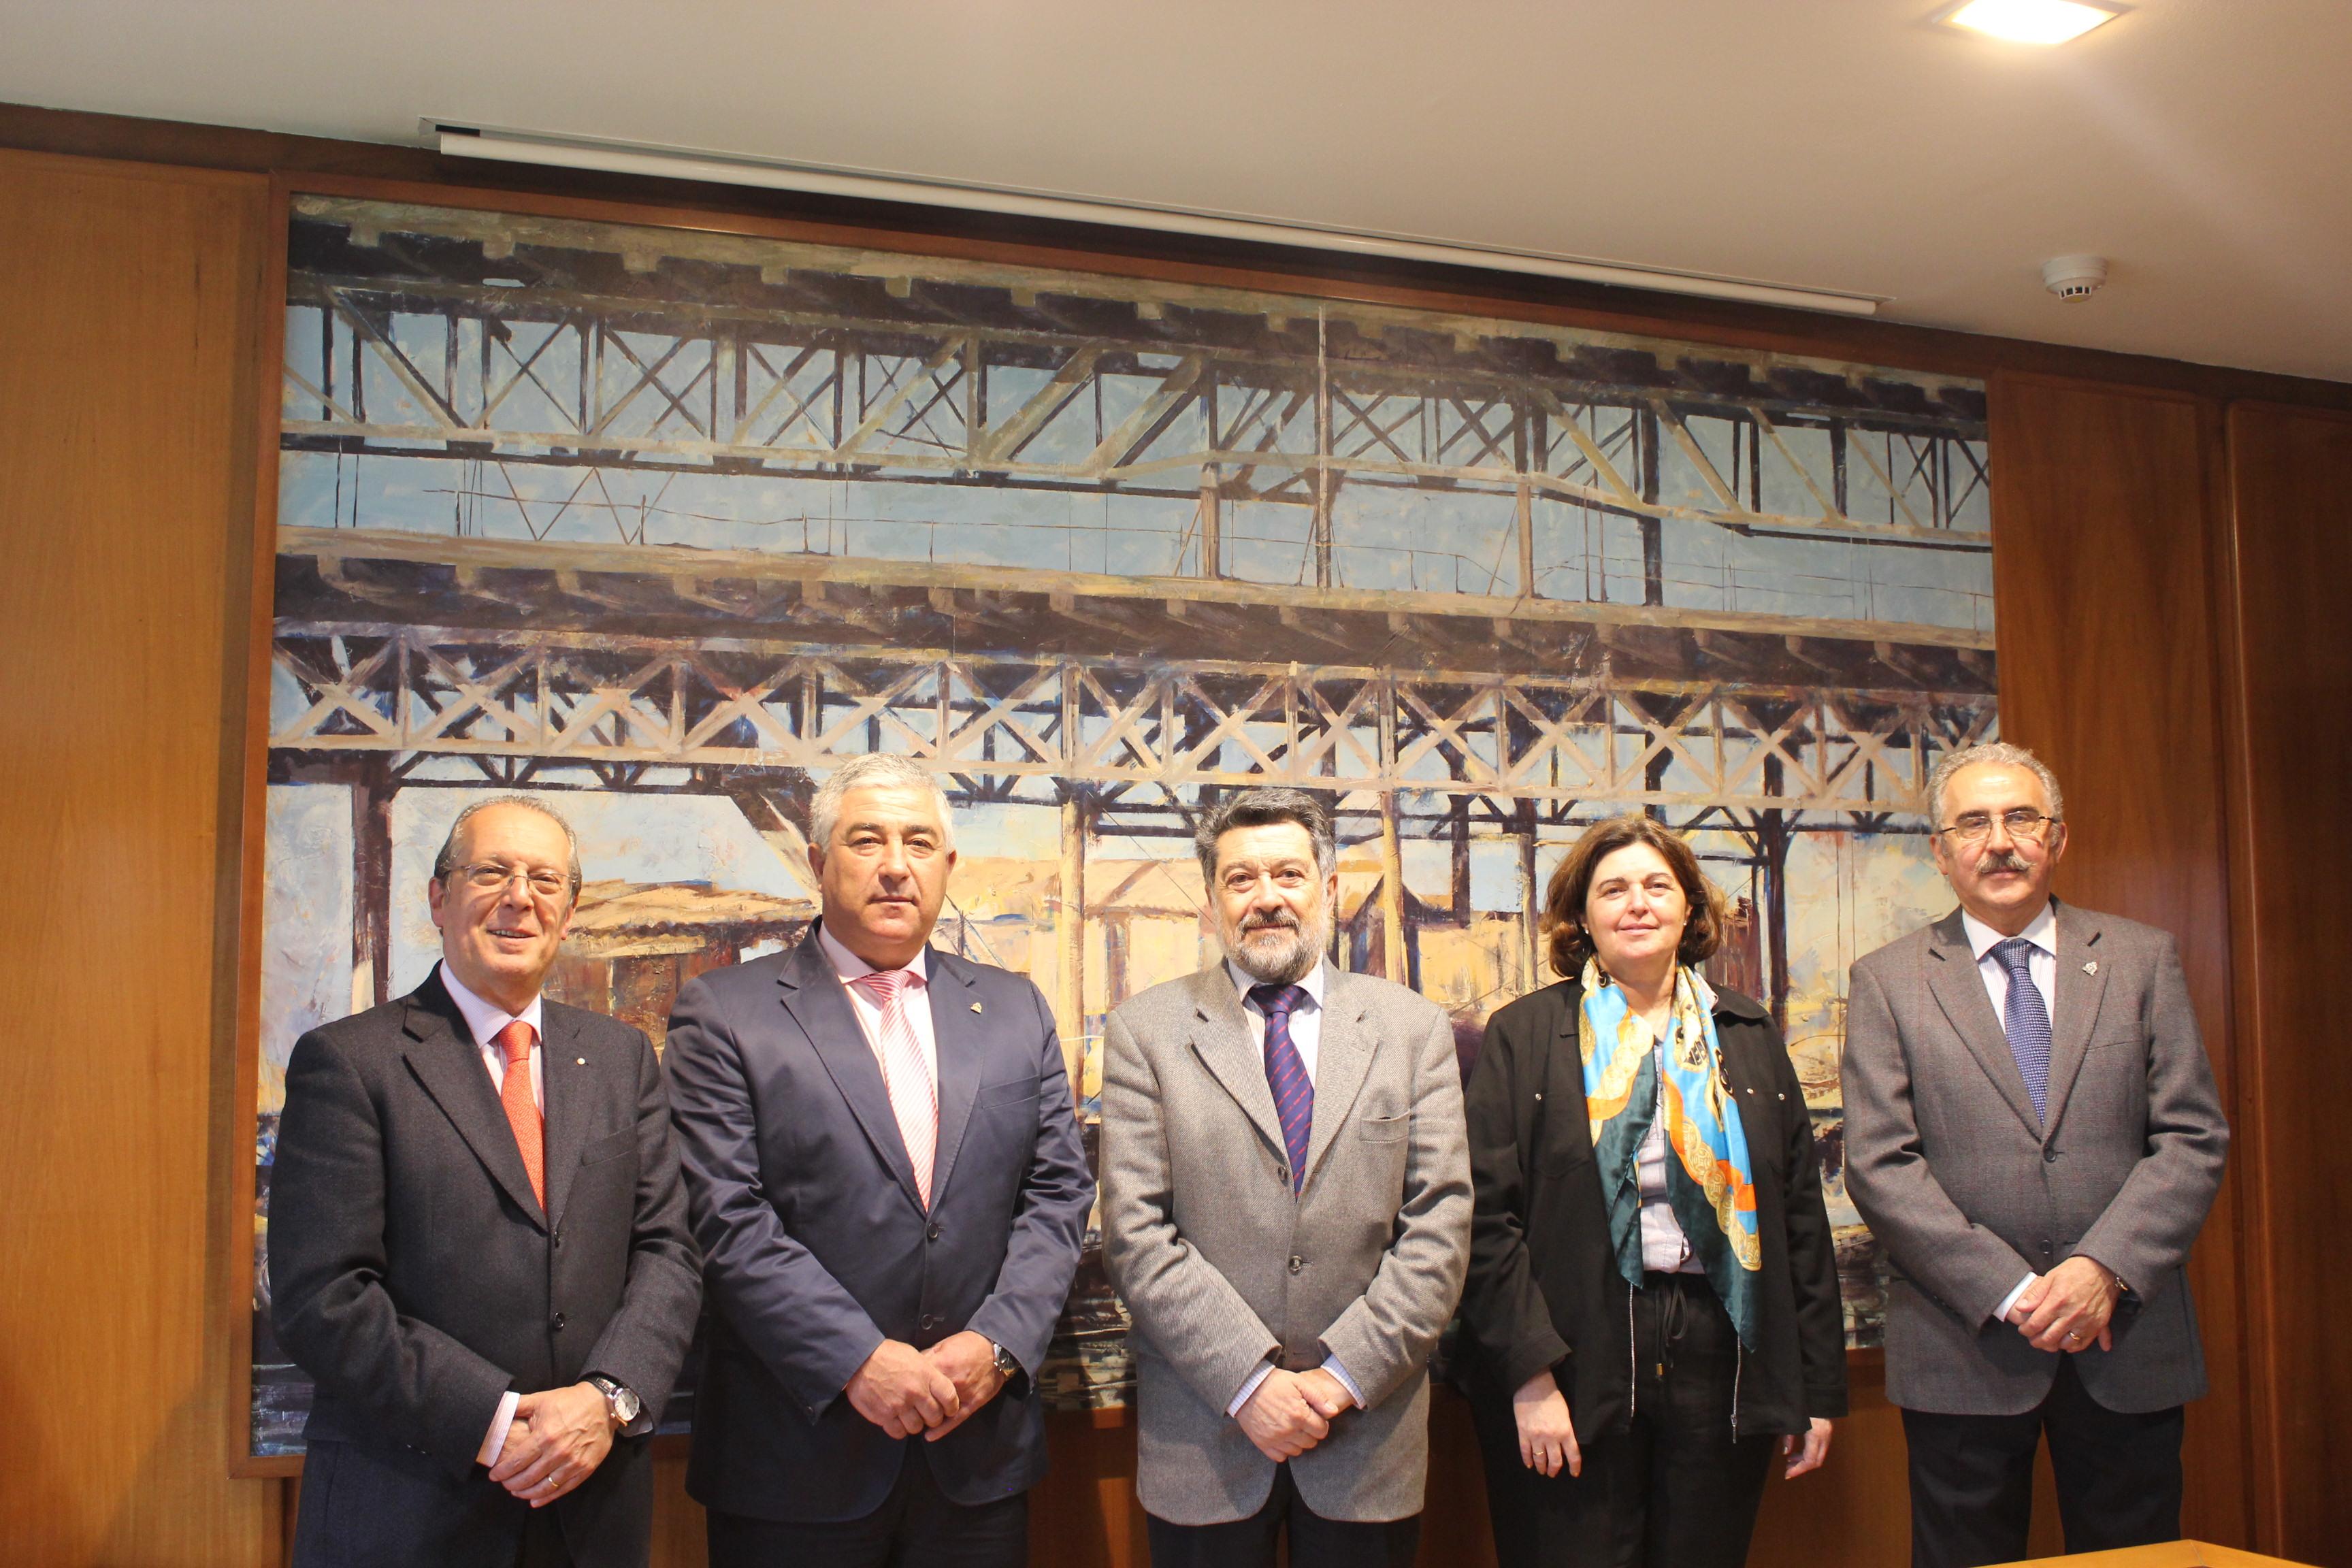 Representantes Real Club Maritimo de Huelva en Puerto de Huelva15abril16